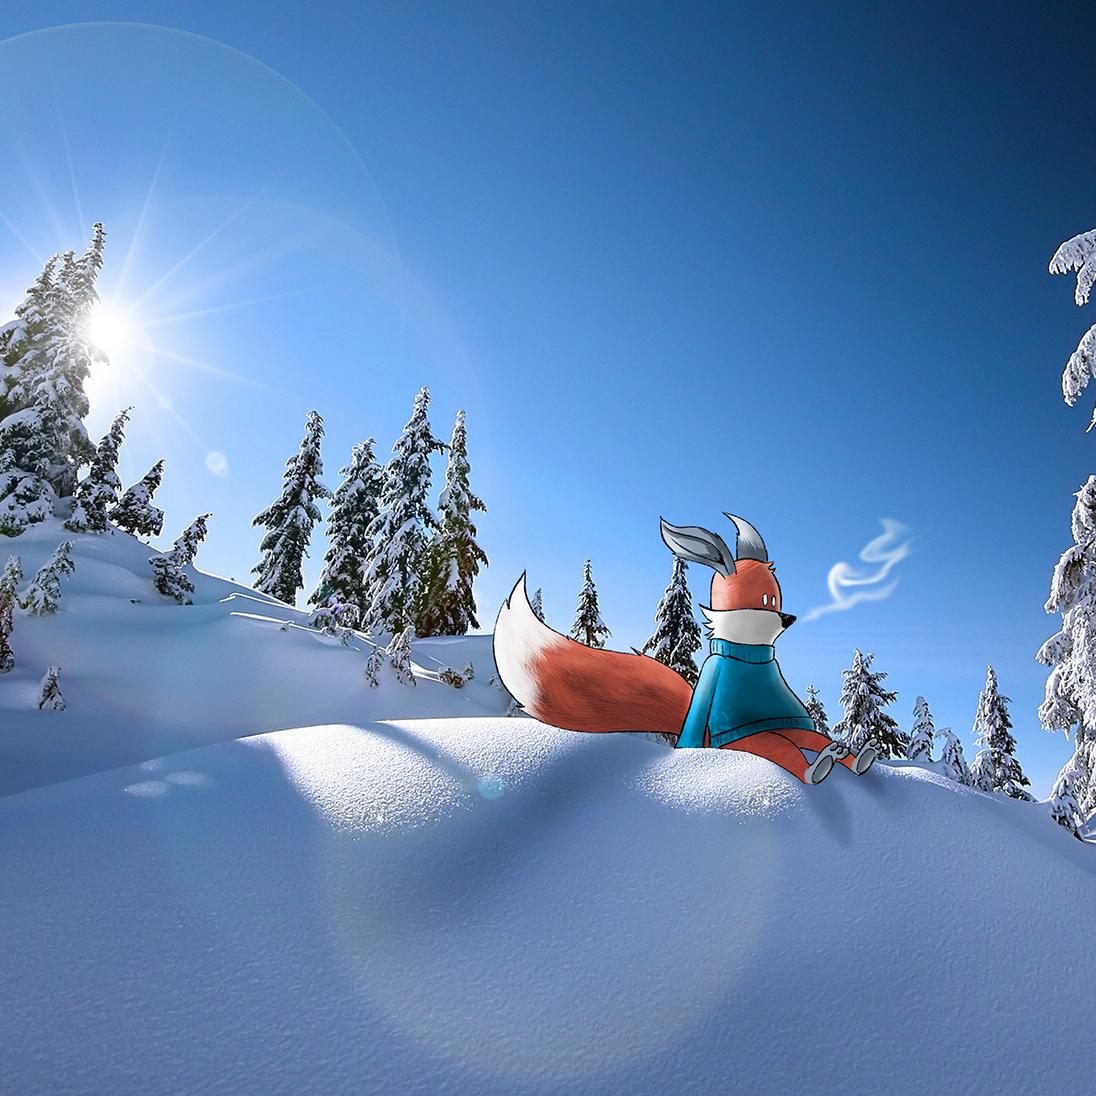 kit-fox-sitting-snow-slope-72-square